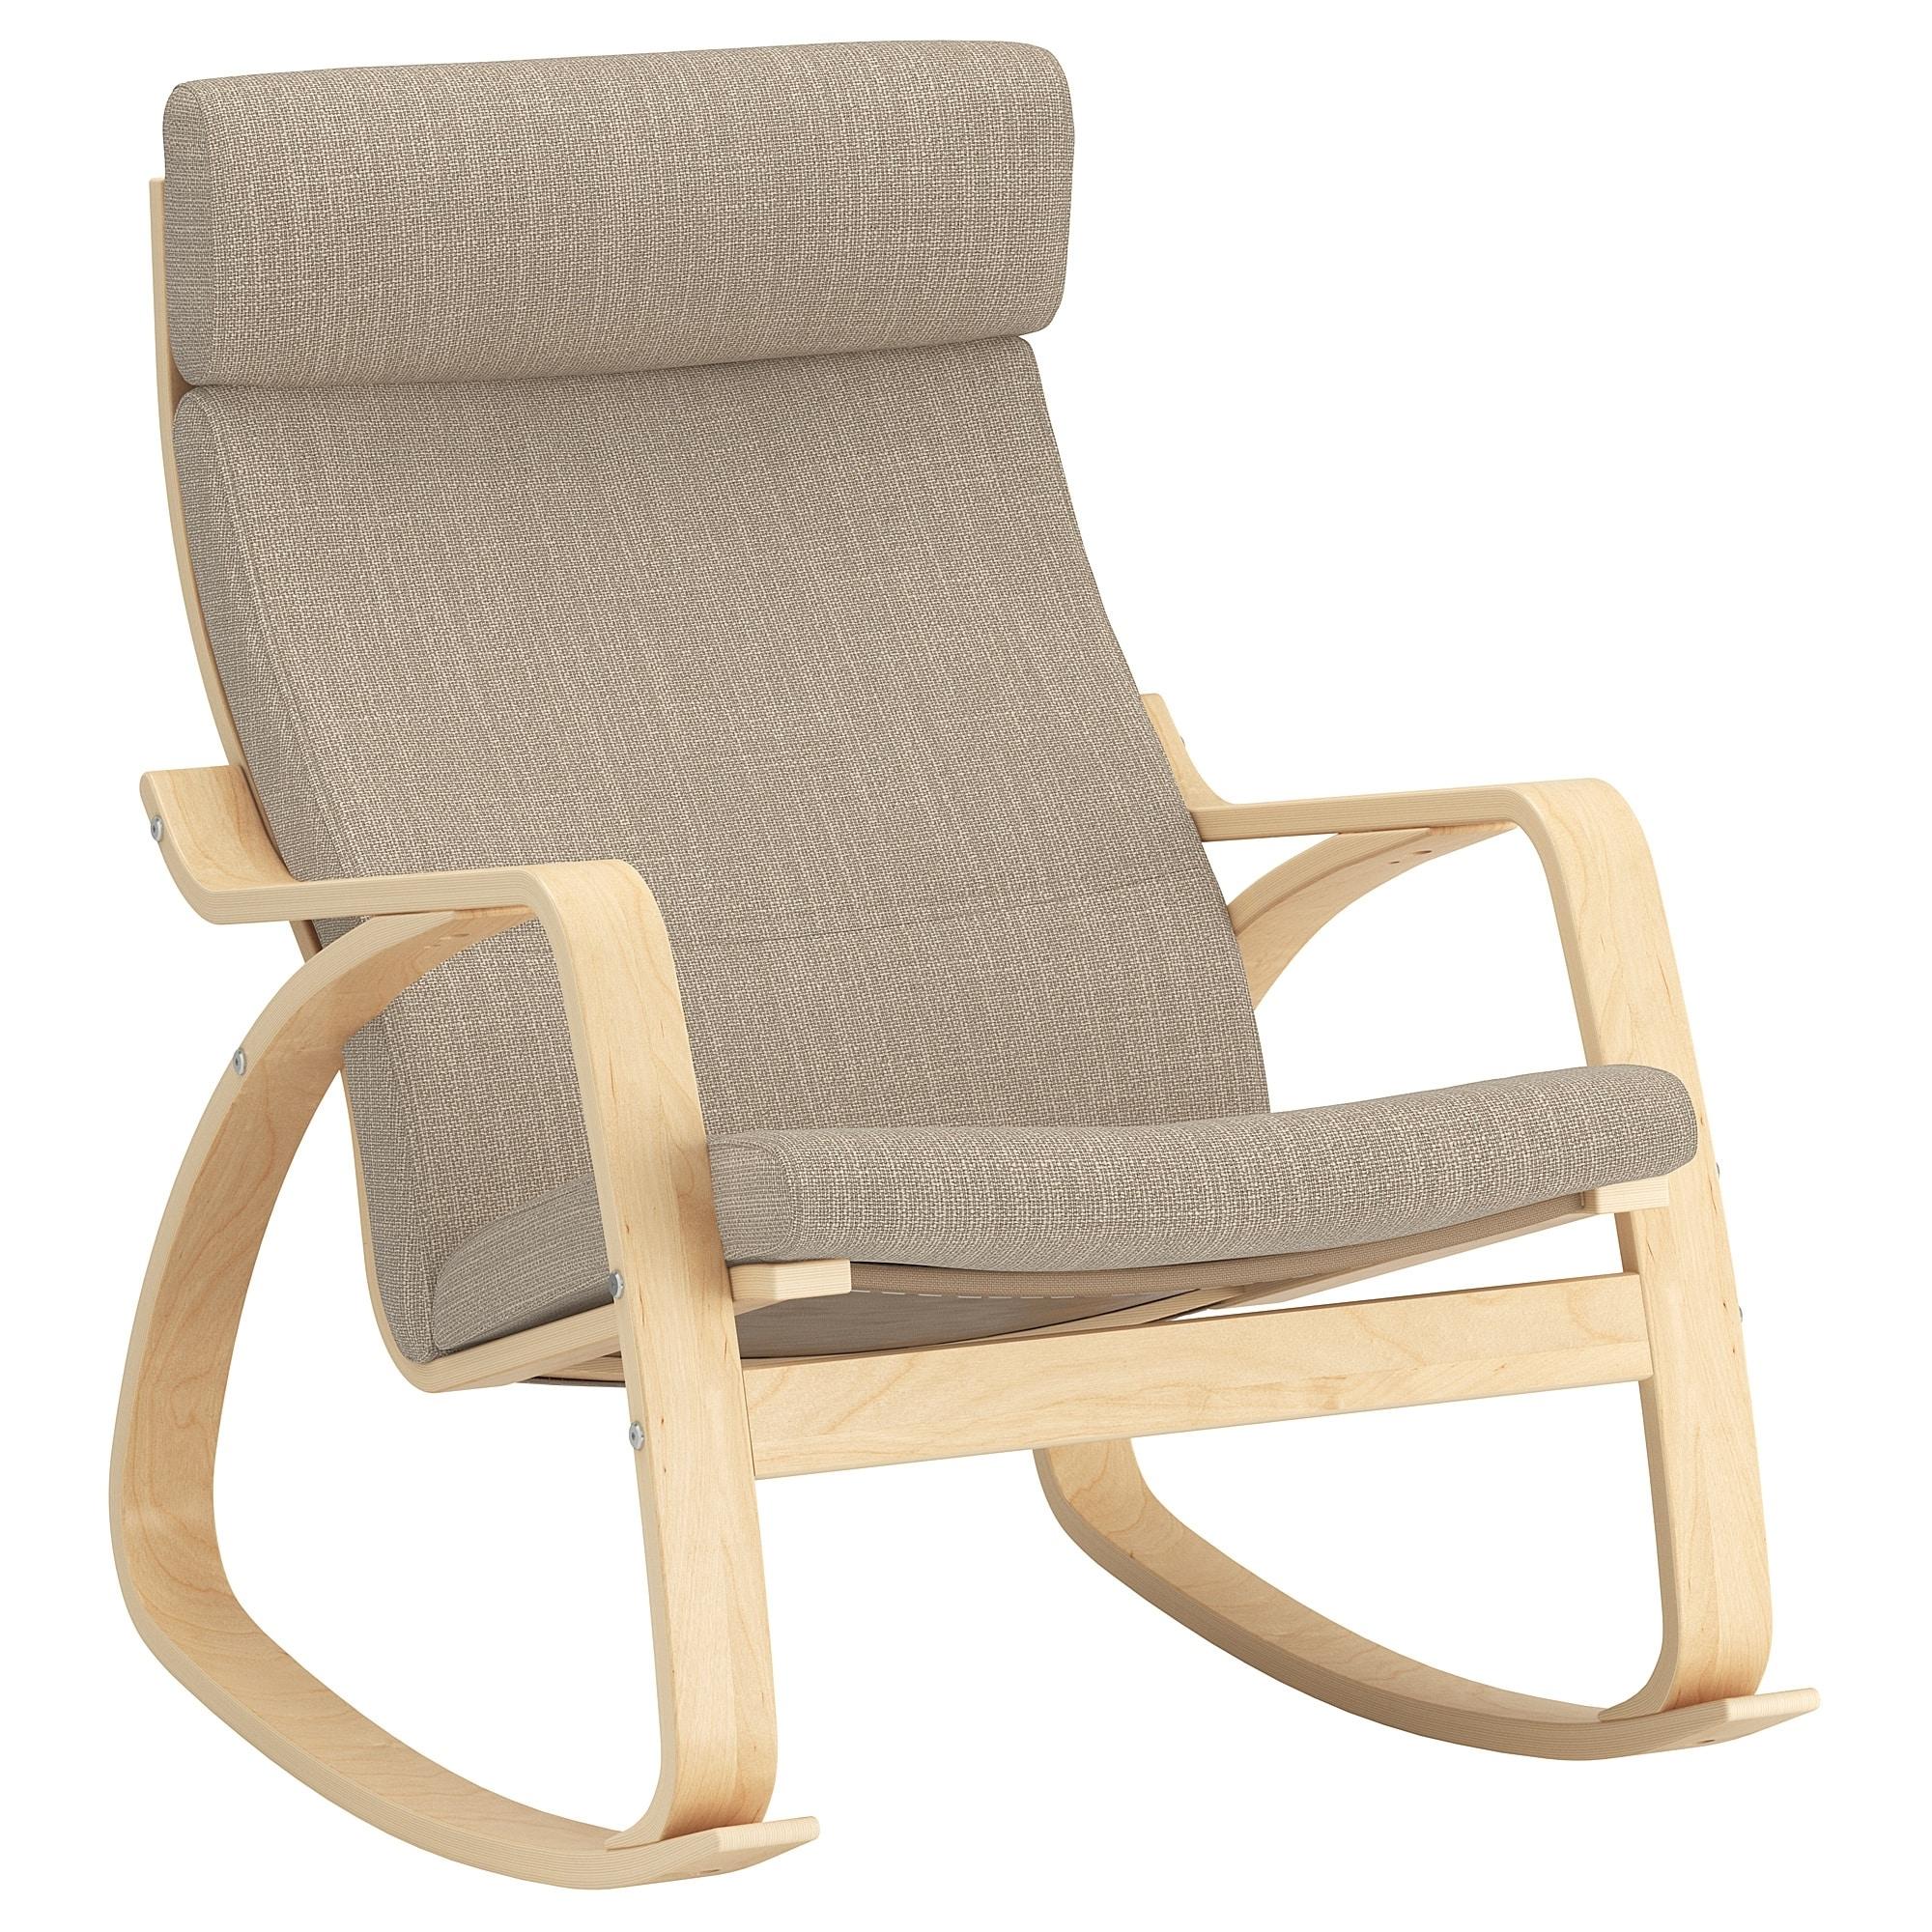 Popular Poäng Rocking Chair Birch Veneer/hillared Beige – Ikea Within Ikea Rocking Chairs (View 9 of 15)